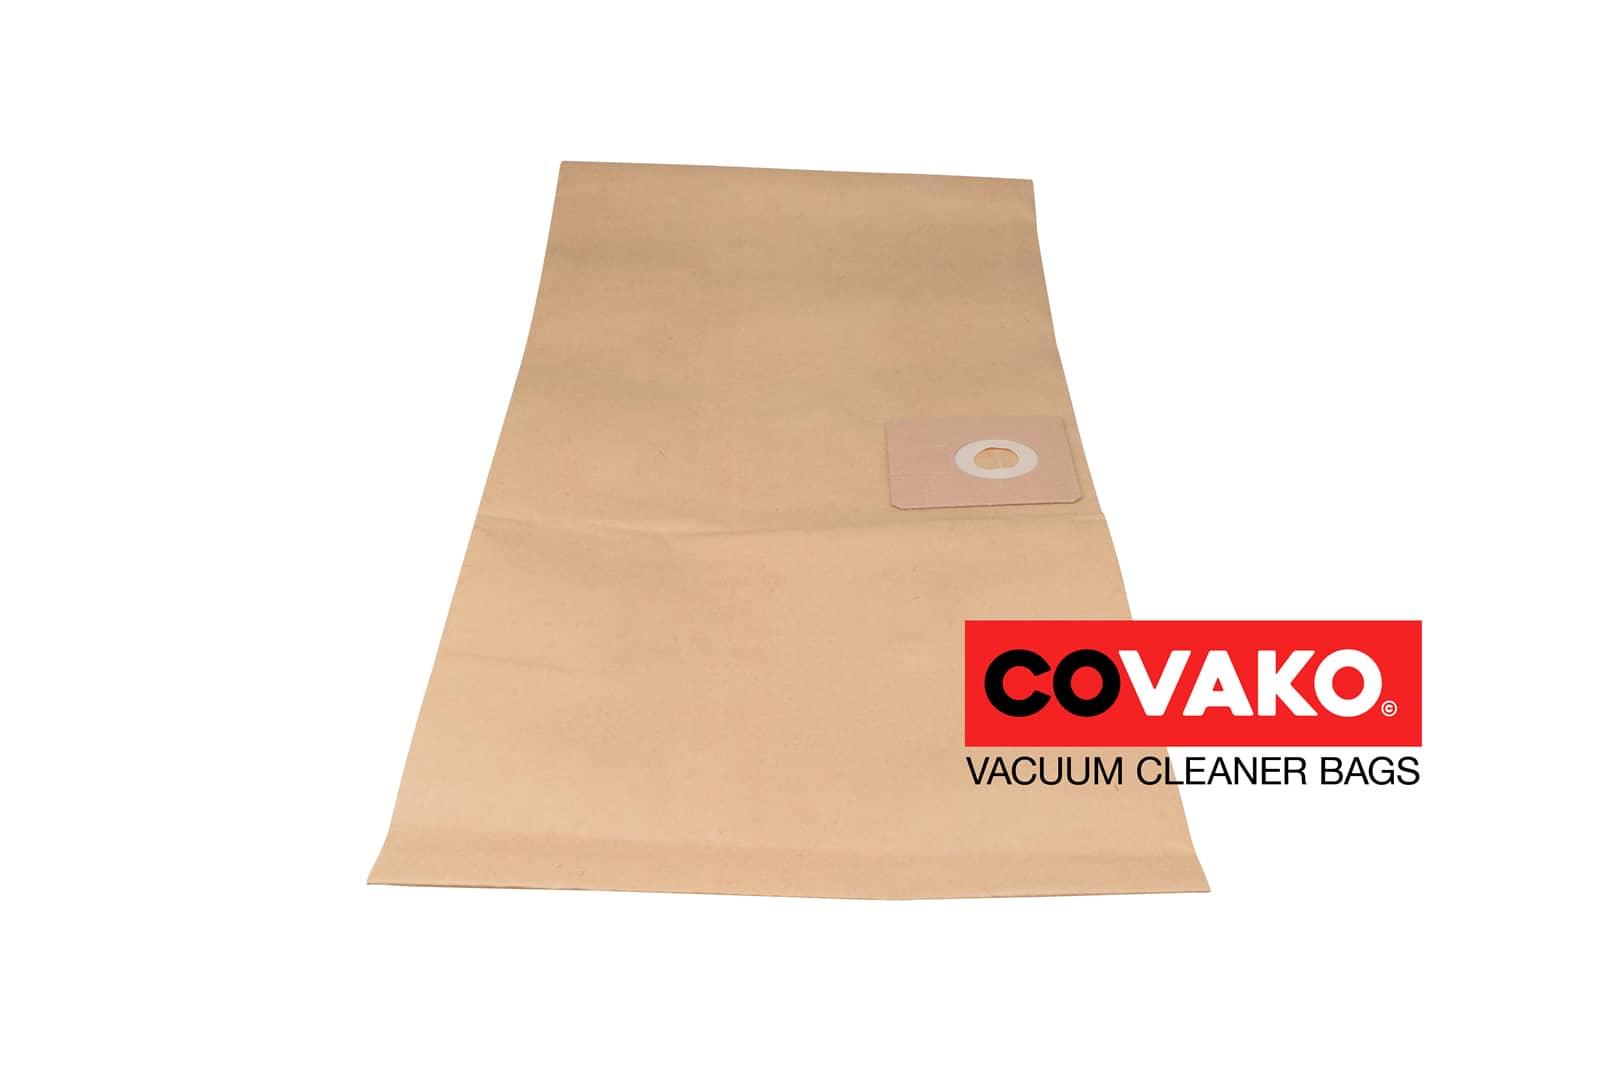 I-vac 25 Eco plus / Paper - I-vac vacuum cleaner bags